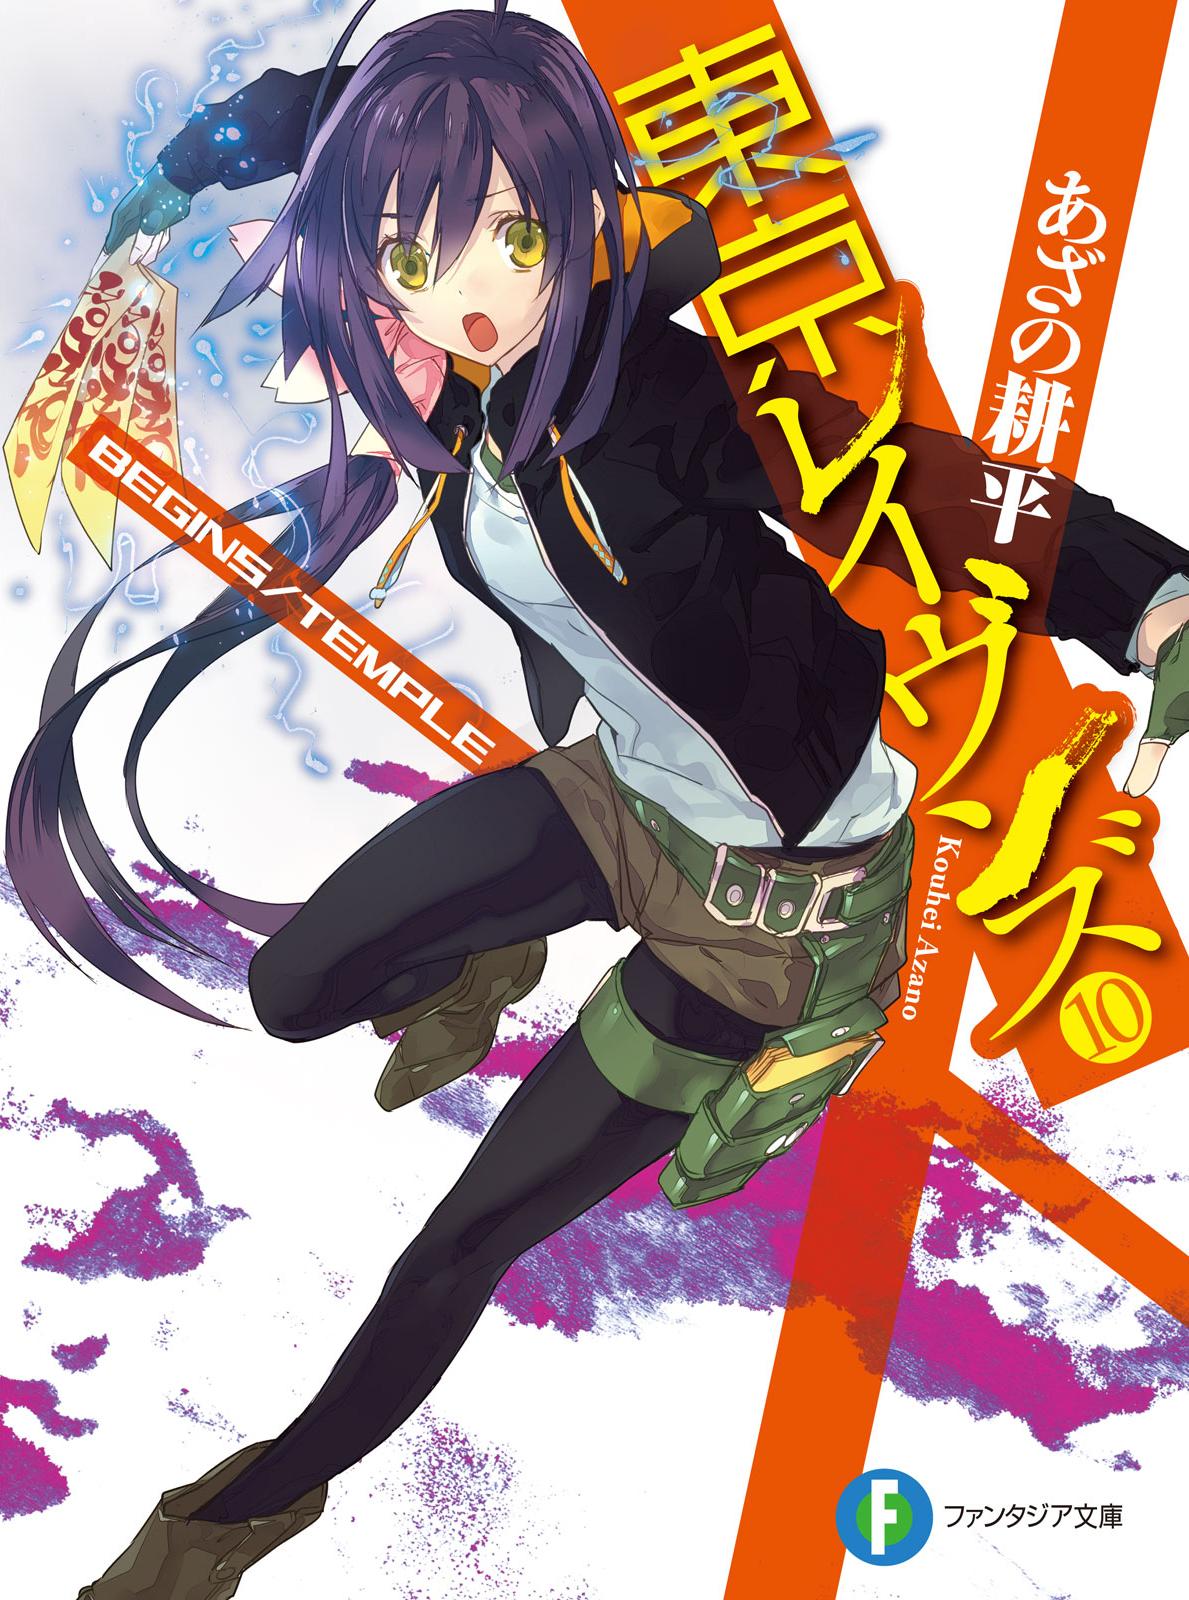 essays from suzuka Consumer reports driving tests and review the compact suv suzuki samurai gained a reputation  mercury suzuka – yuuka  and essays.